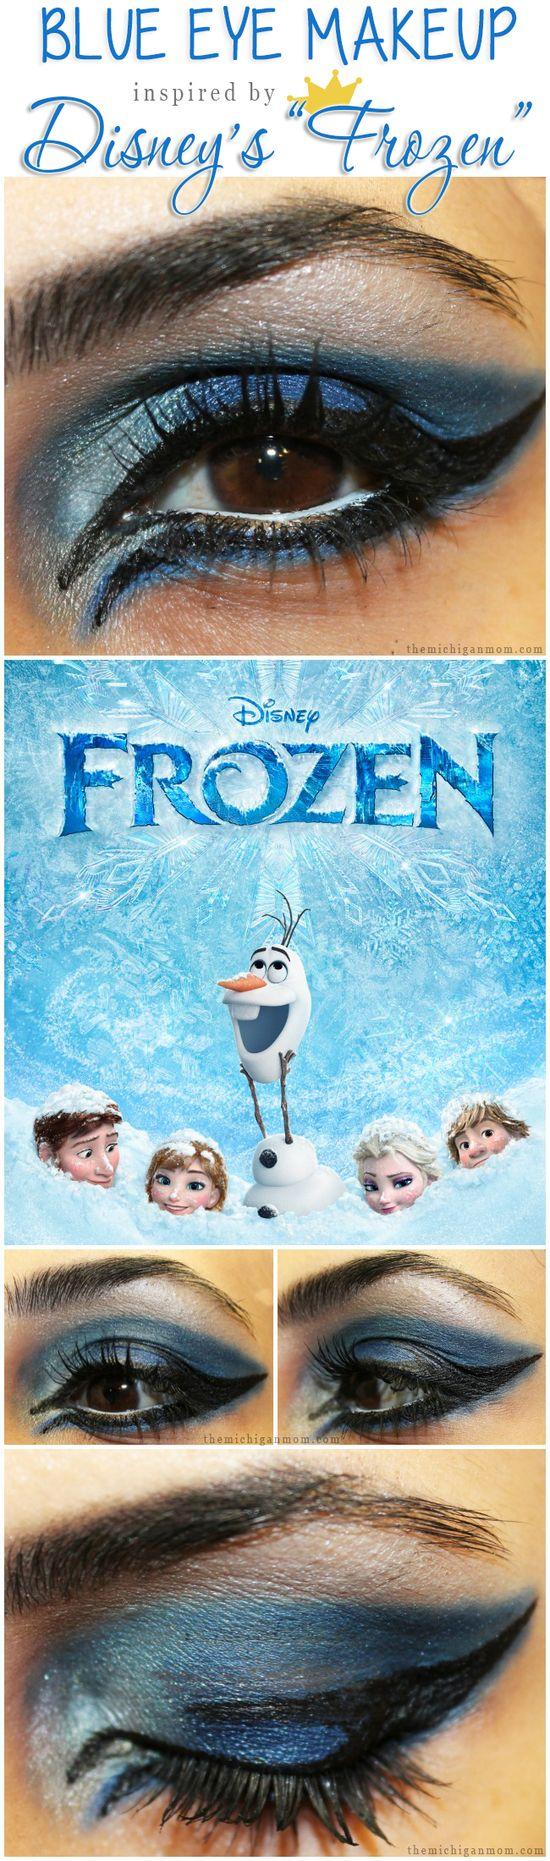 Blue Eye Makeup Inspired by Disney's Frozen- The Michigan Mom #makeup #beauty #disney #disneyfrozen